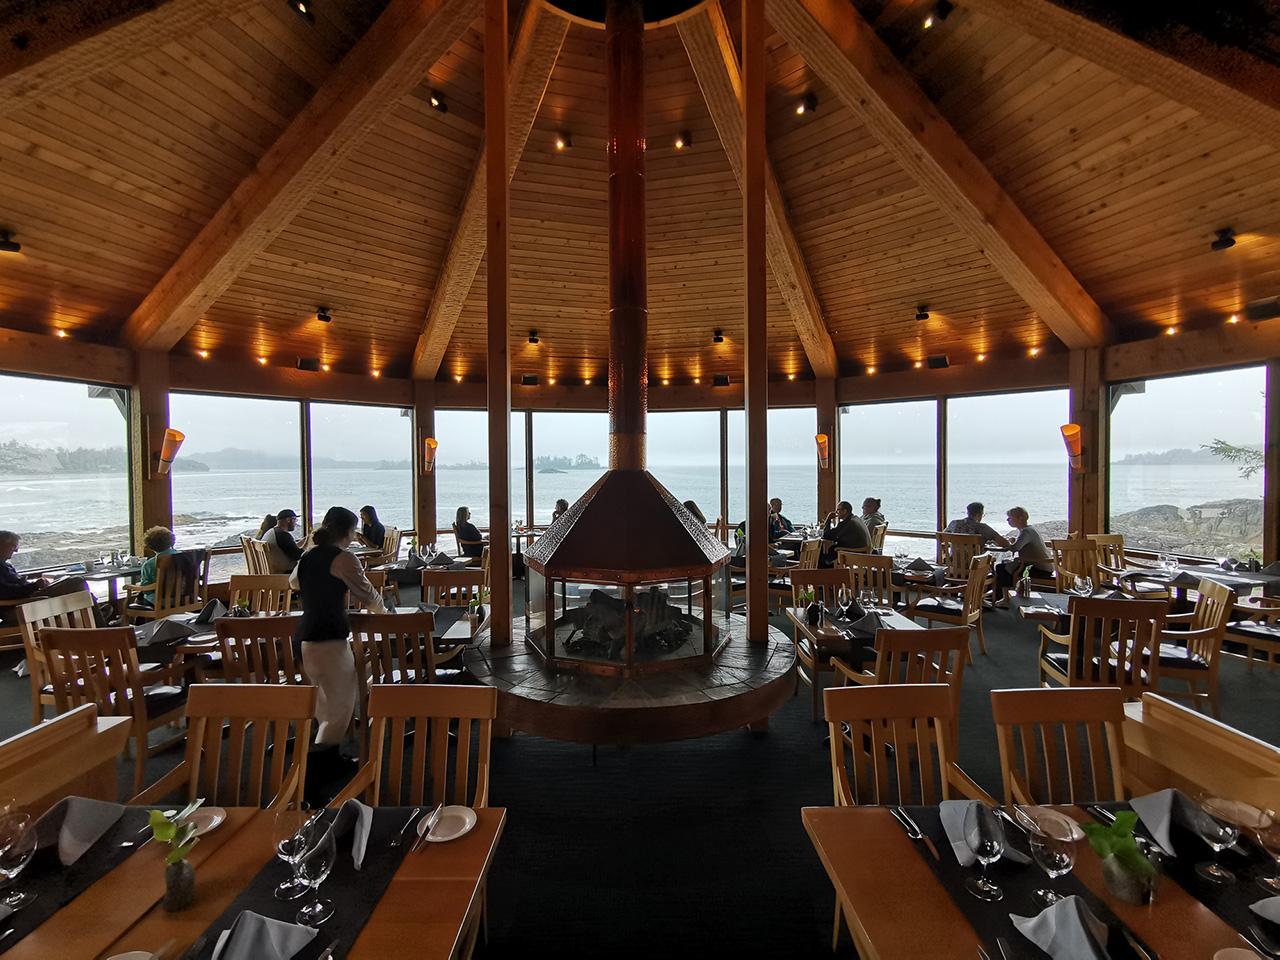 Wickaninnish Inn Gourmet Restaurant View